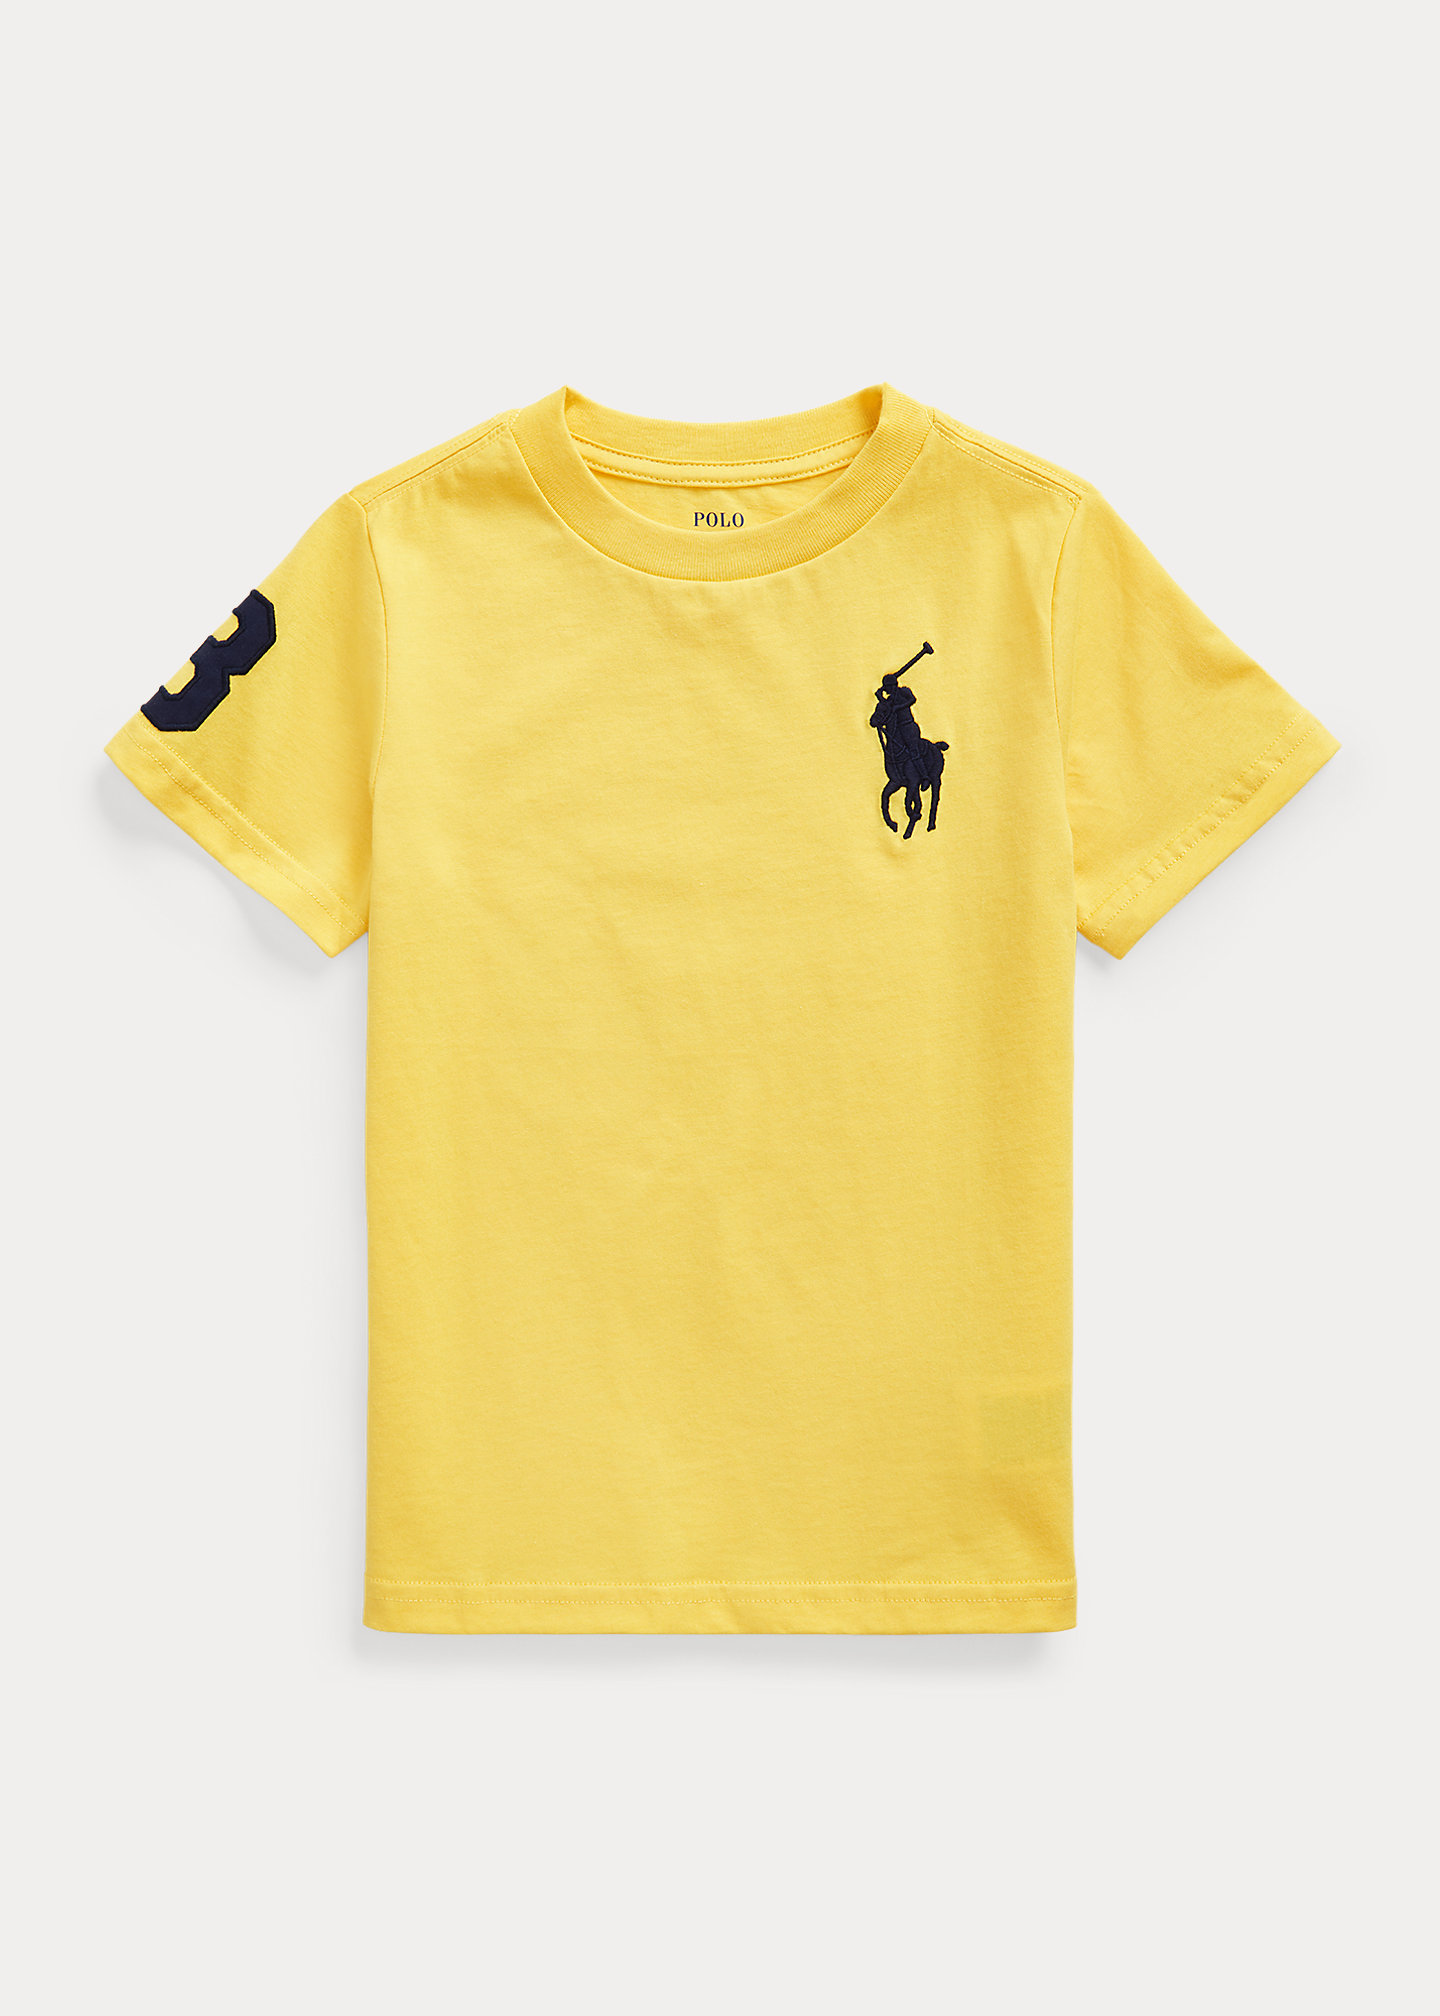 Polo Ralph Lauren Big Pony Cotton Jersey Tee